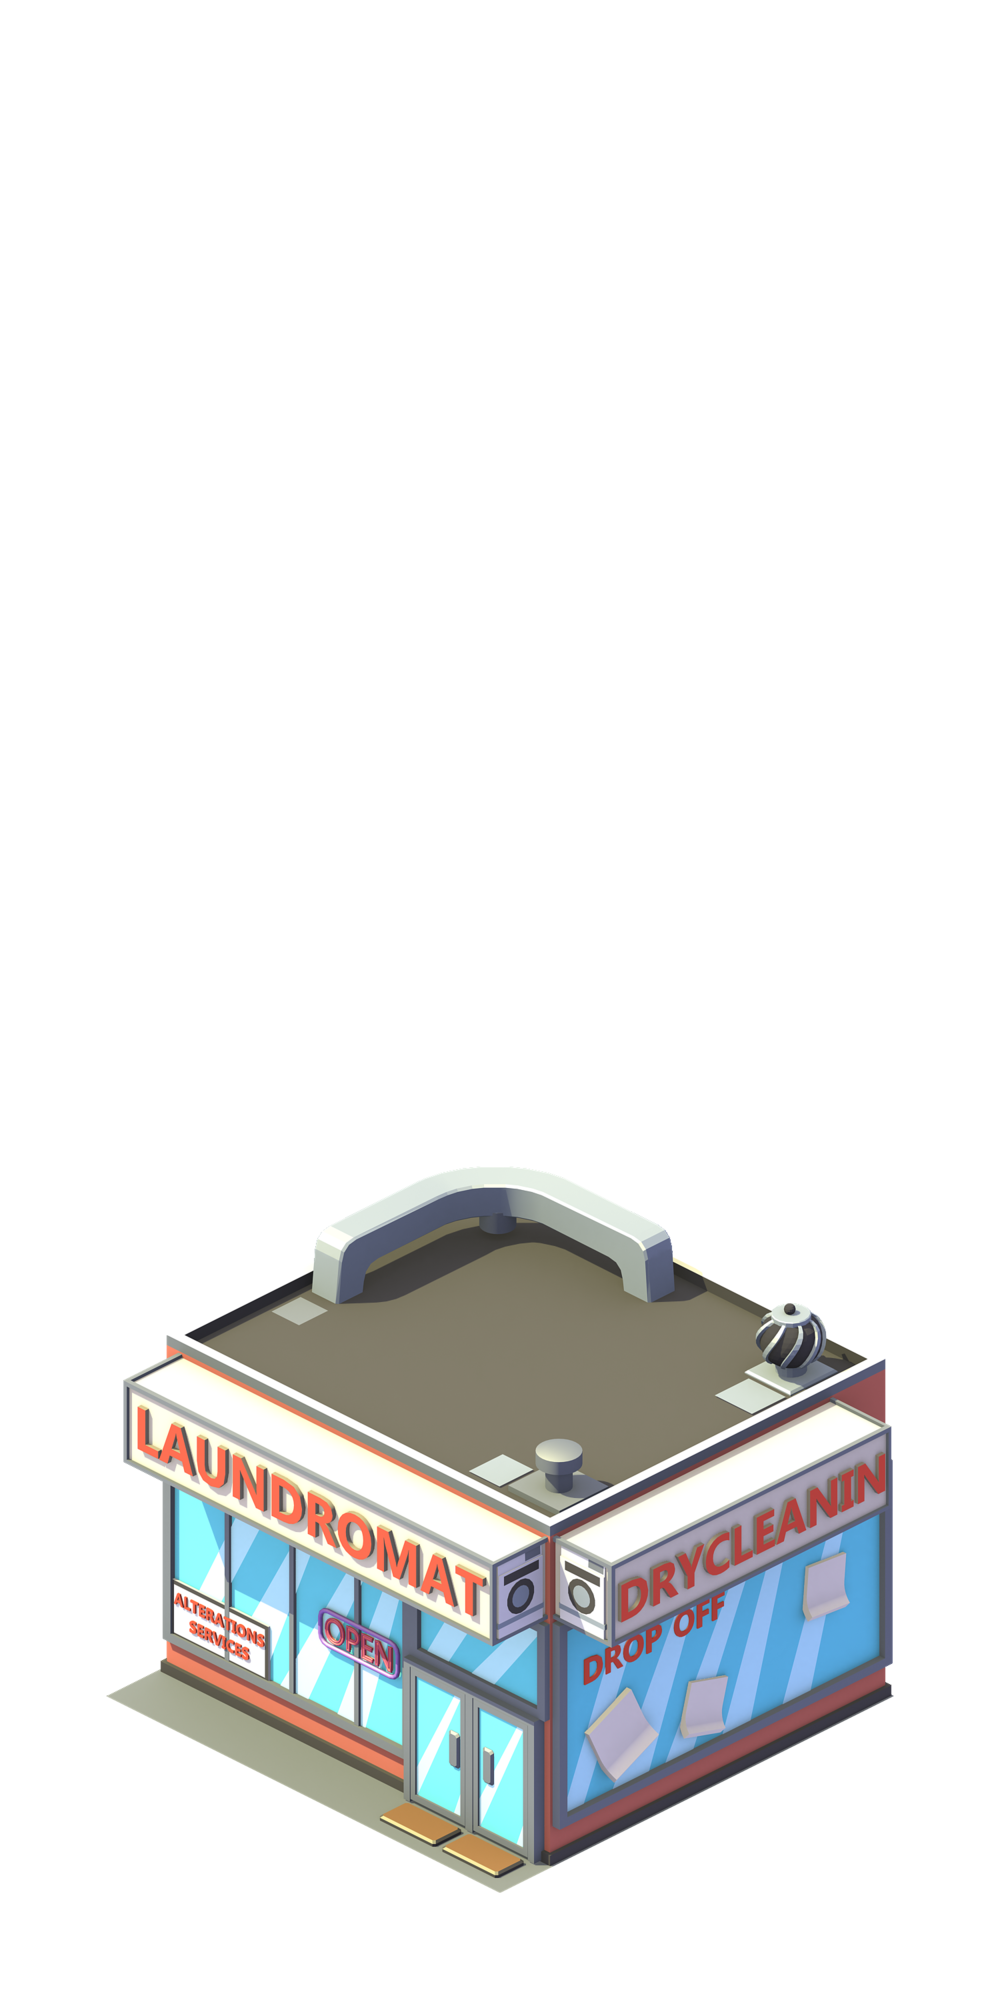 Laundromat.png